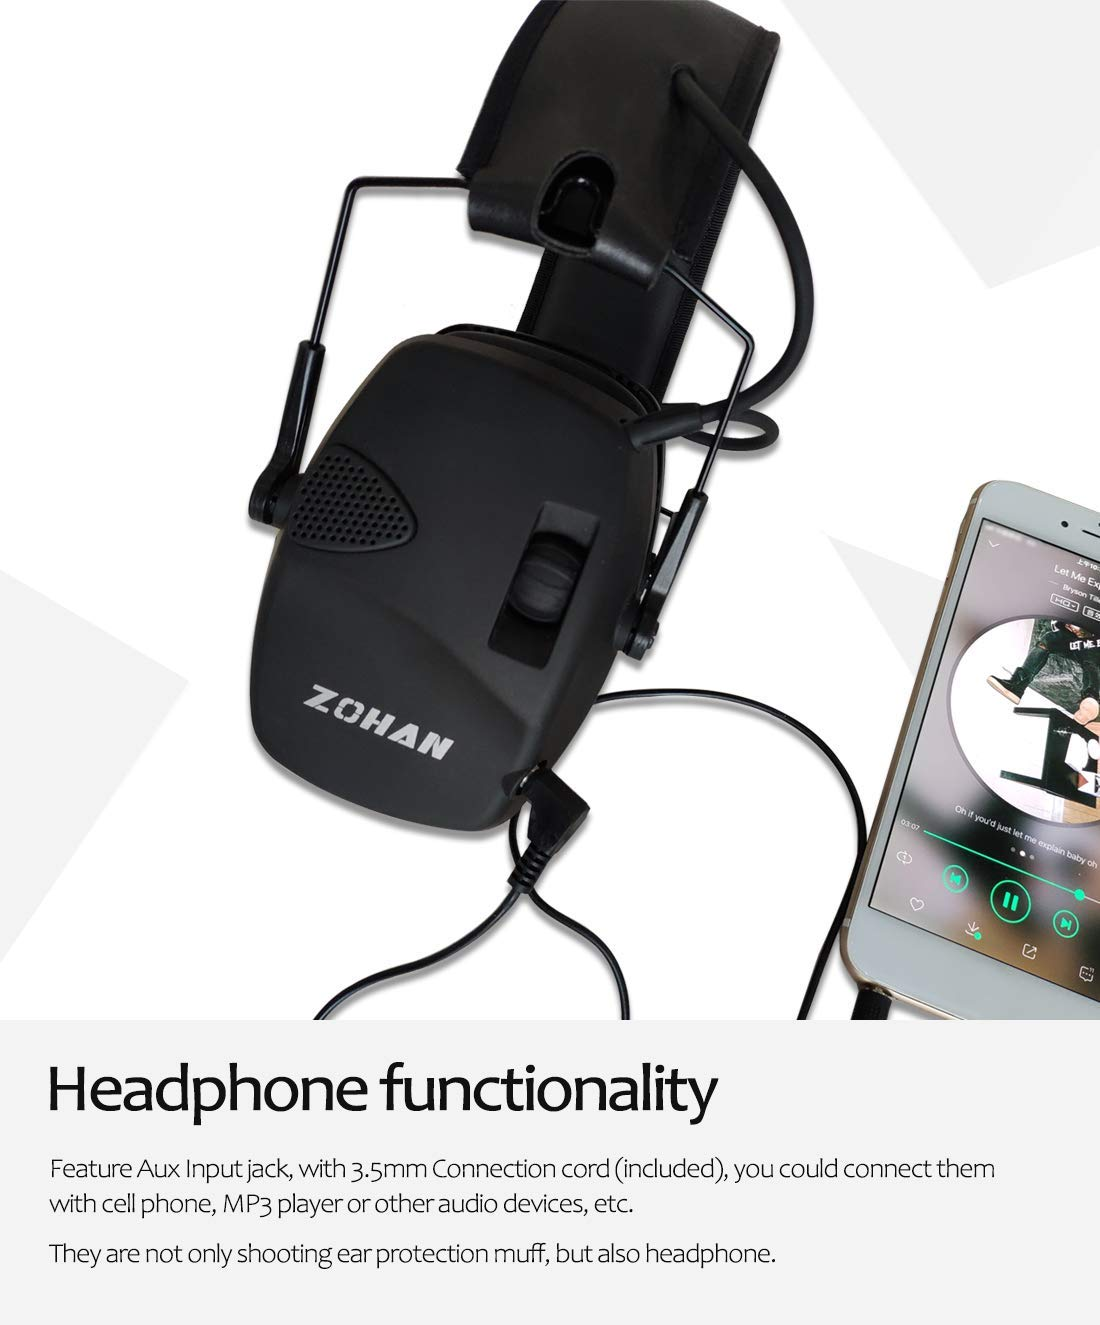 H21af471ea3fc43f8b74be43626d3ec227 - หูฟังลดเสียง ป้องกันหู ที่ปิดหู ลดเสียงดังที่ได้ยิน ลดการได้ยินเสียง NRR22dB Professional